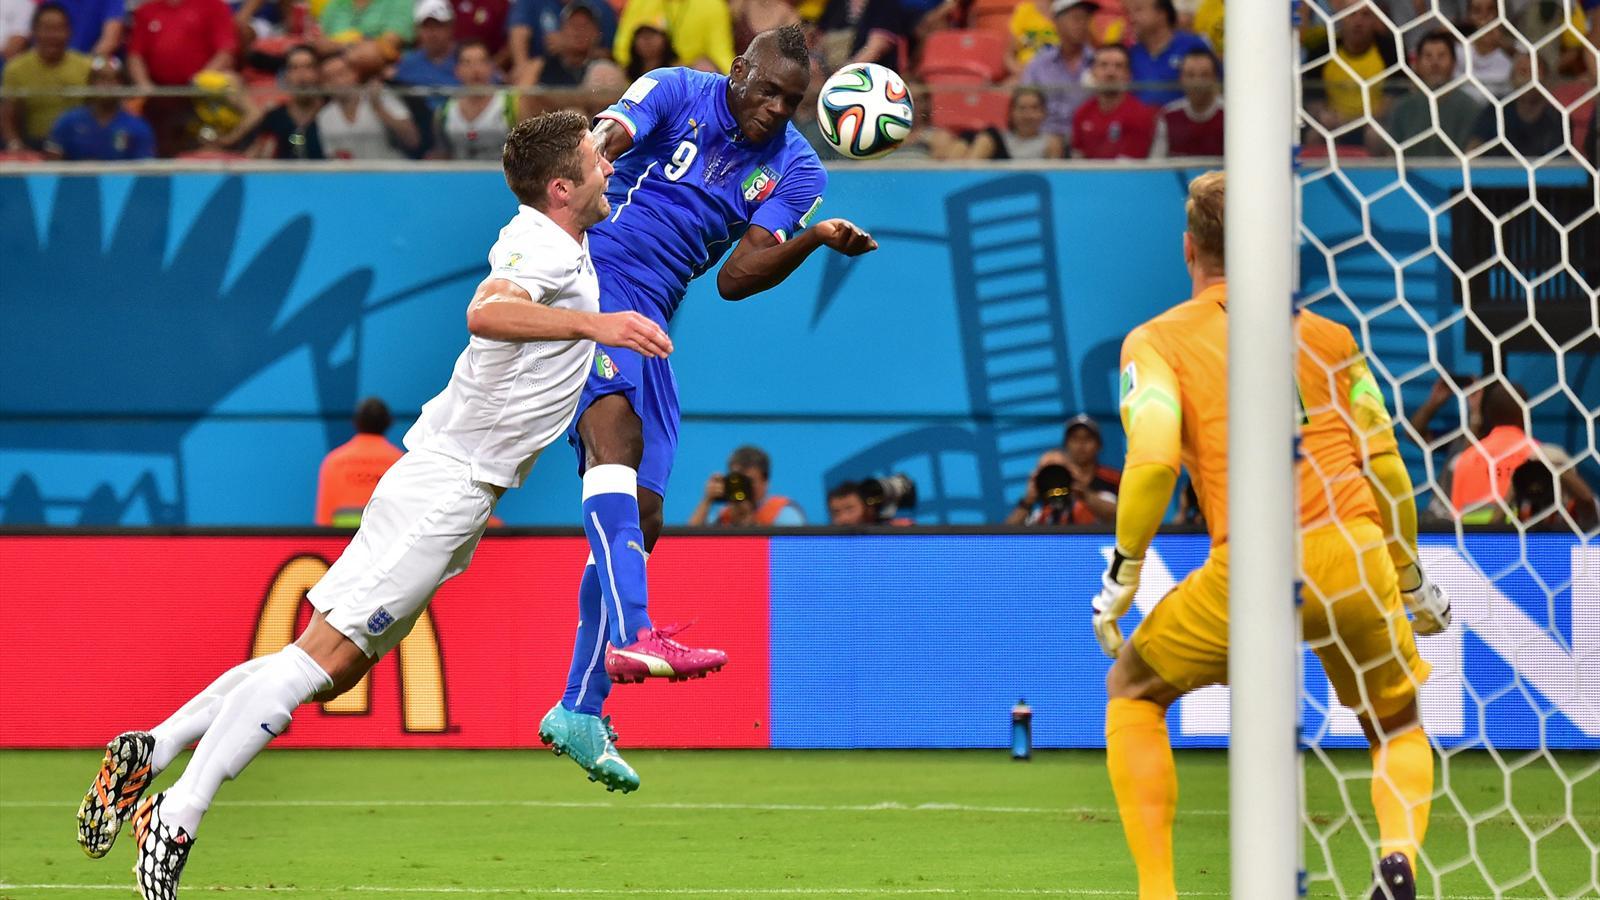 En direct live angleterre italie coupe du monde 15 juin 2014 eurosport - Calendrier coupe d angleterre ...